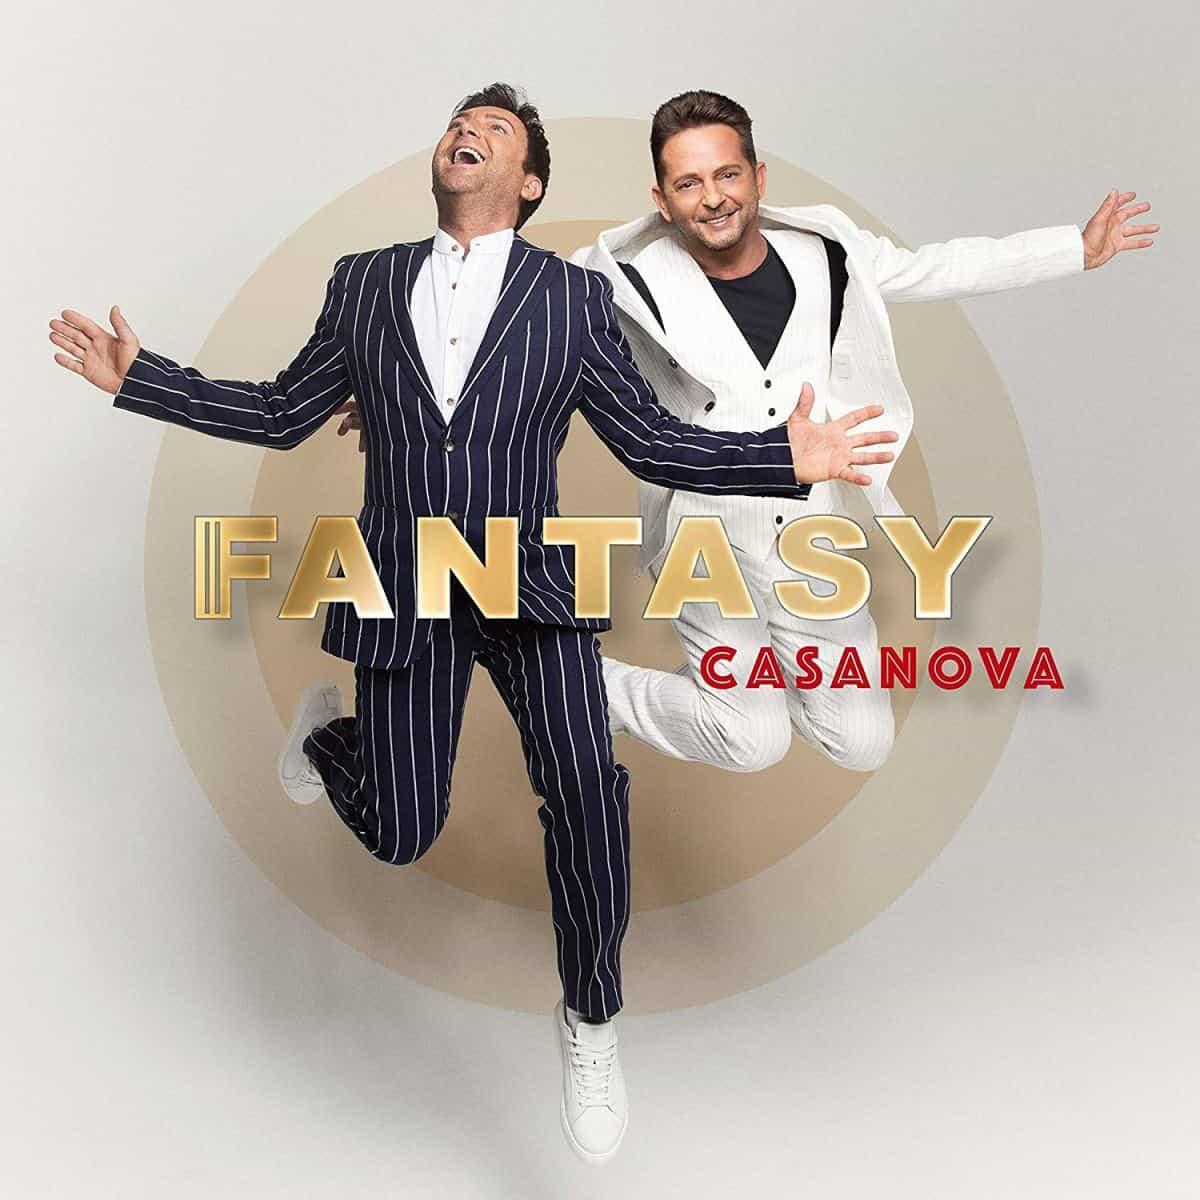 Fantasy - Neue CD Casasova 2019